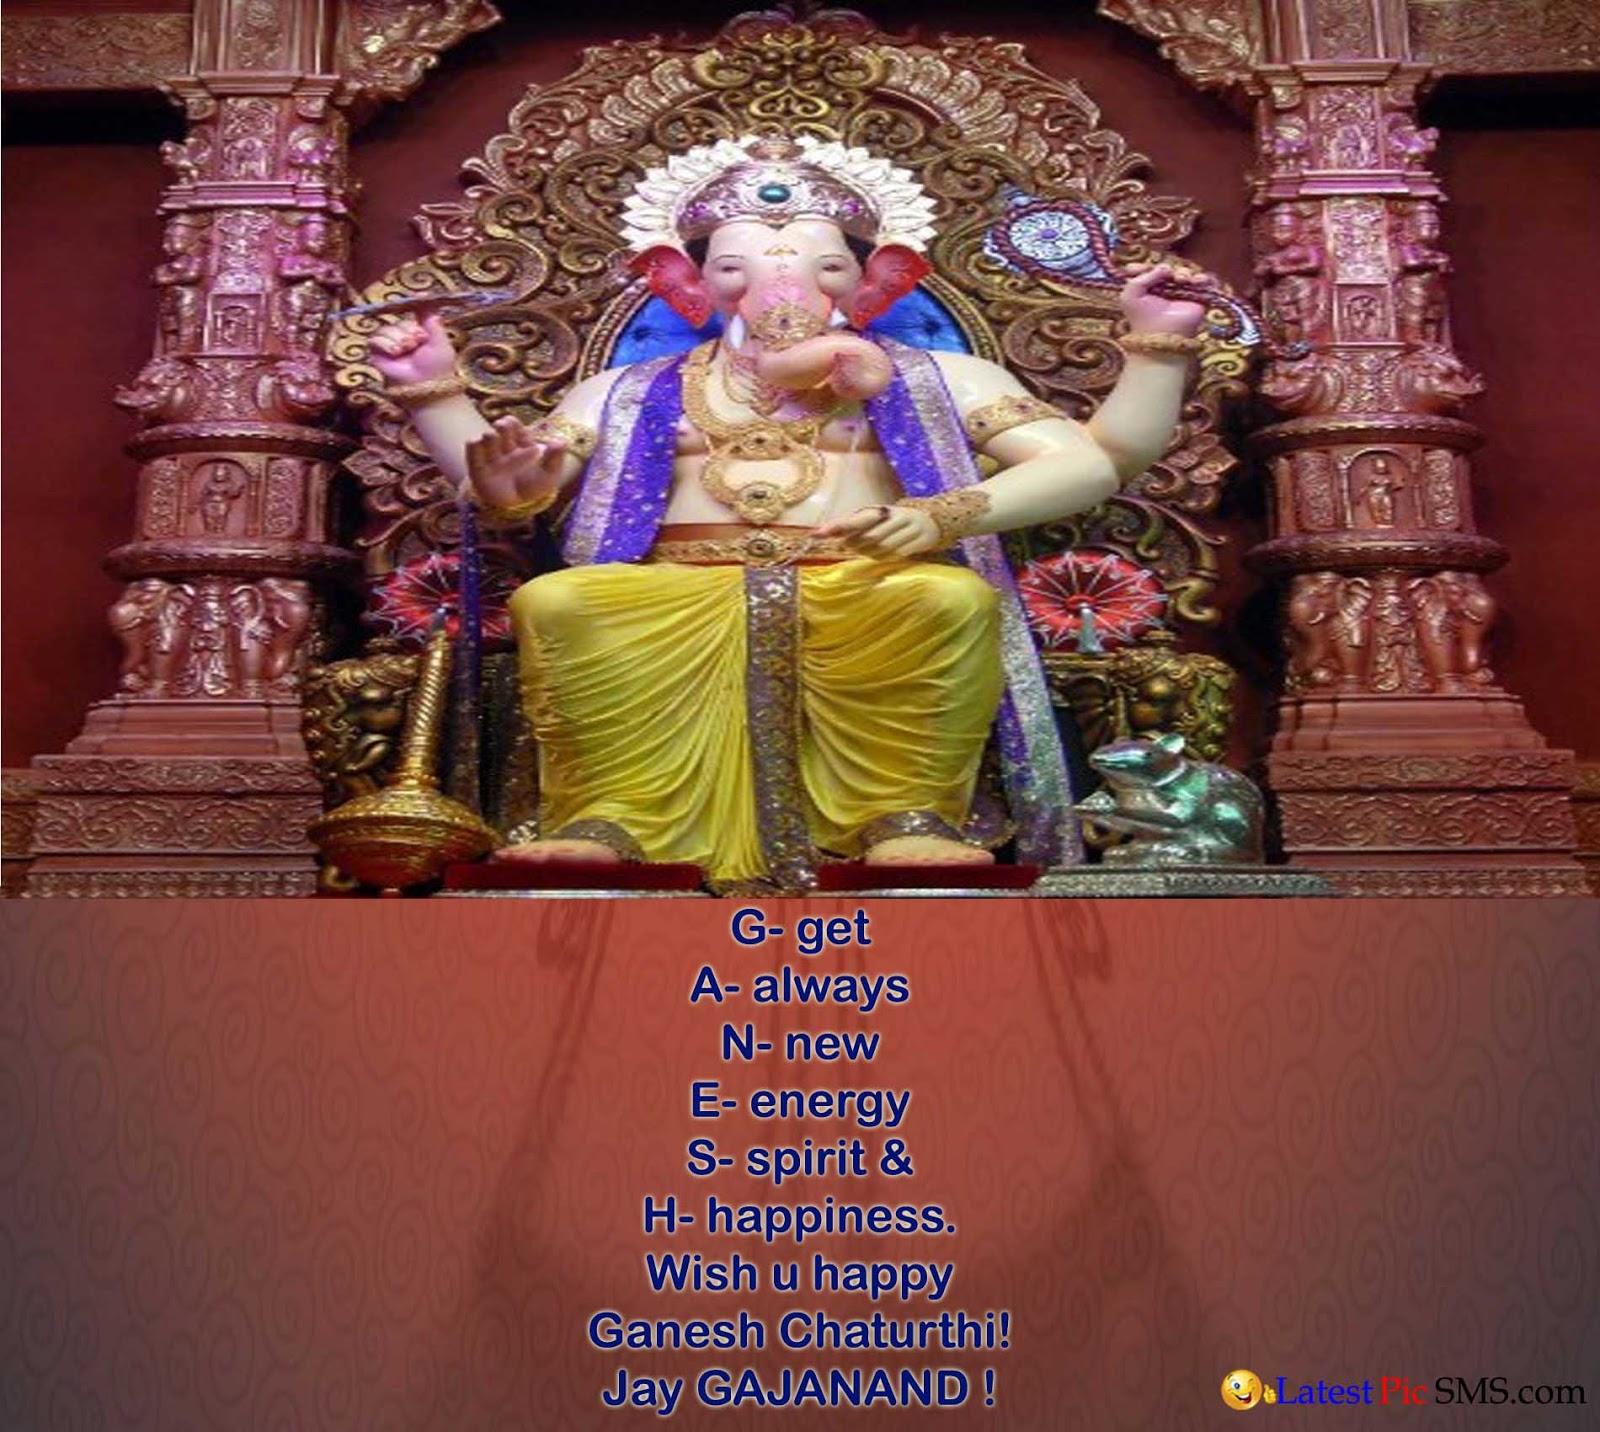 Lal bag cha raja Ganesha Mumbai india Images